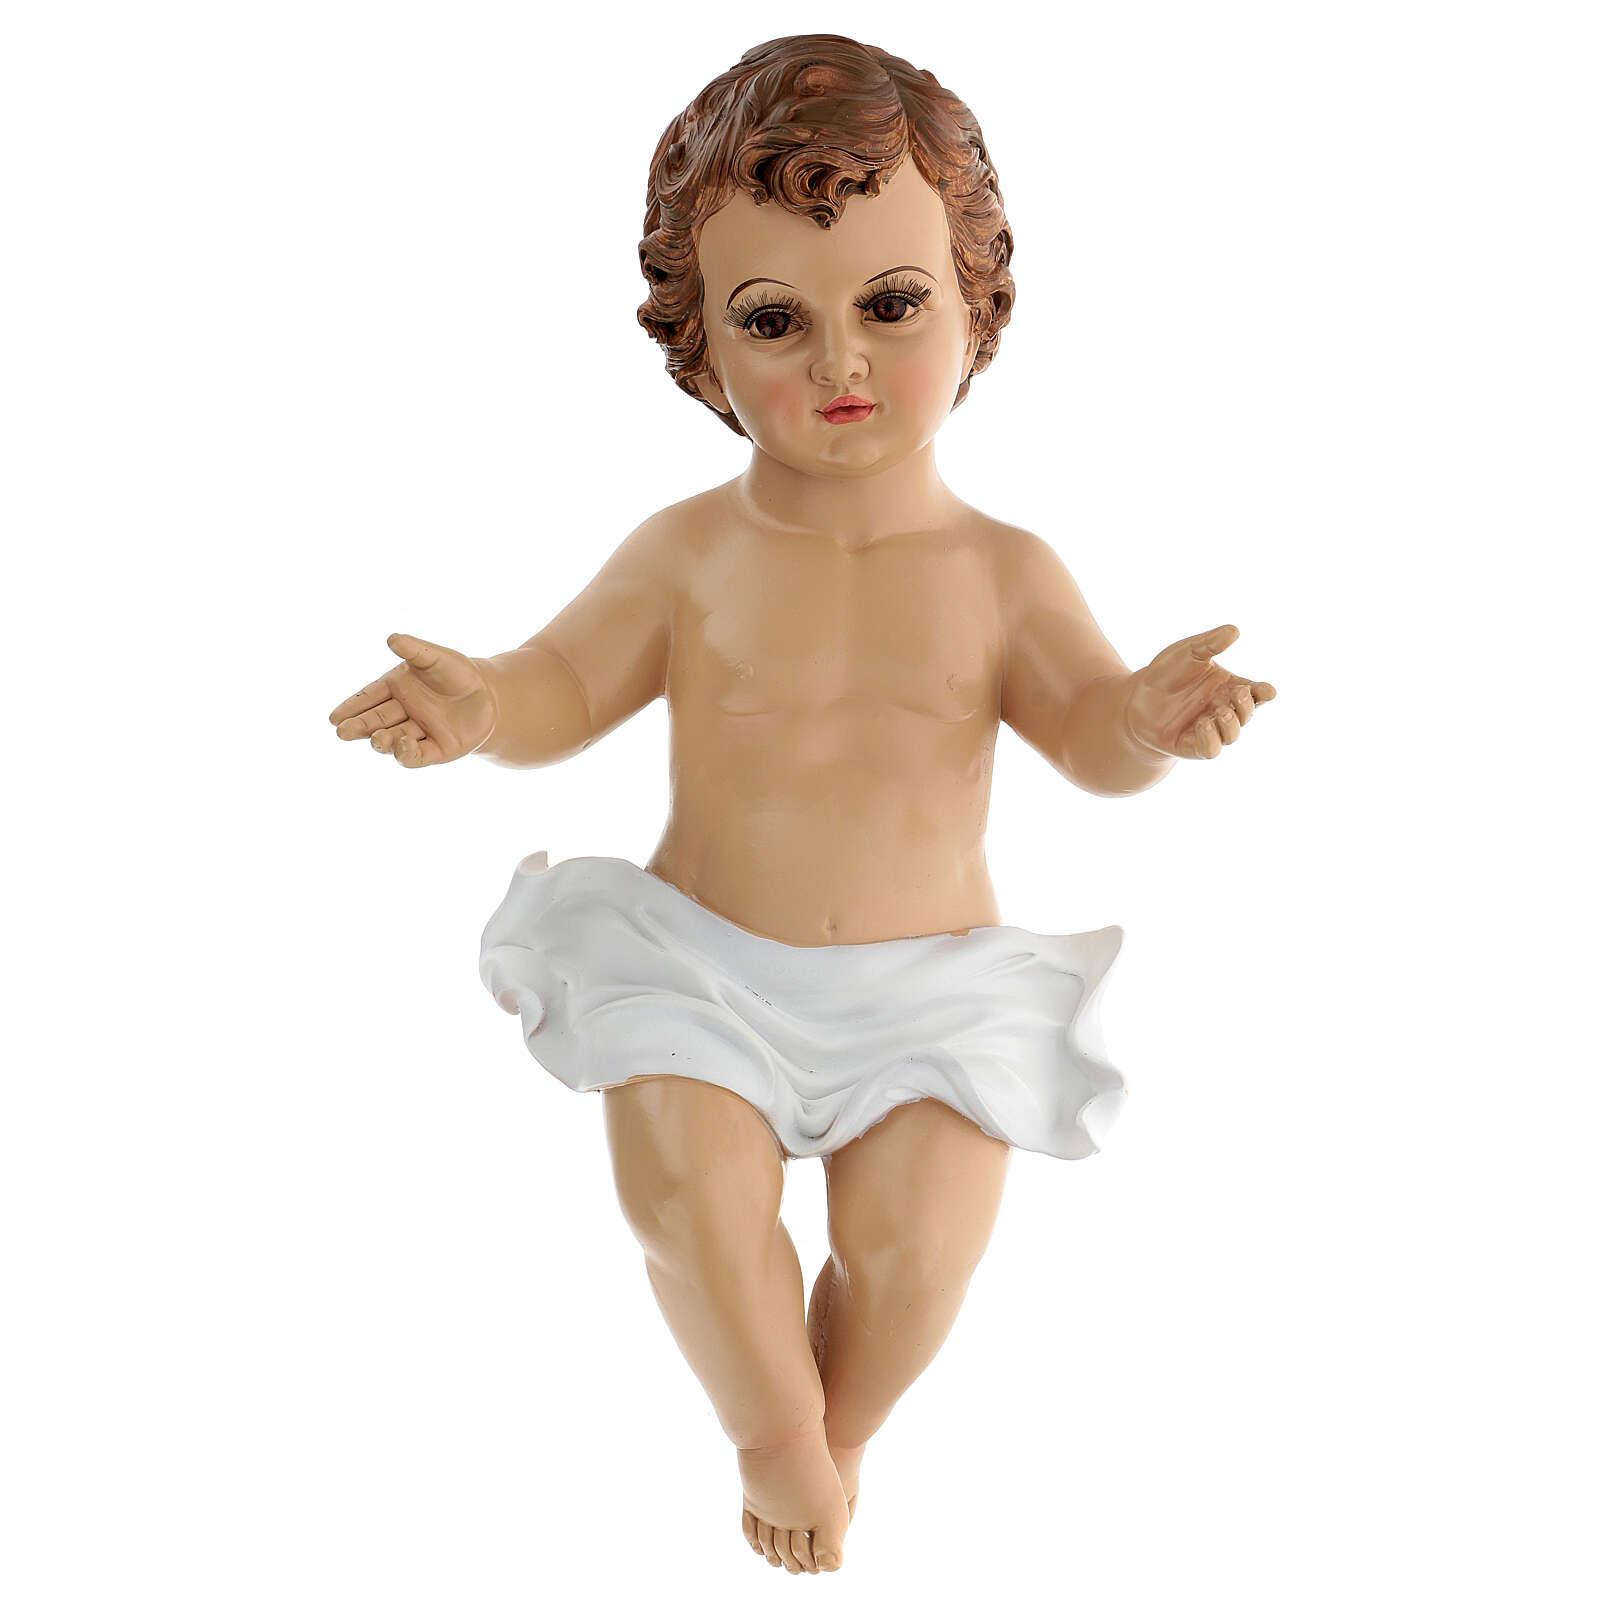 Gesù Bambino occhi vetro resina 45 cm presepe 150 cm 3